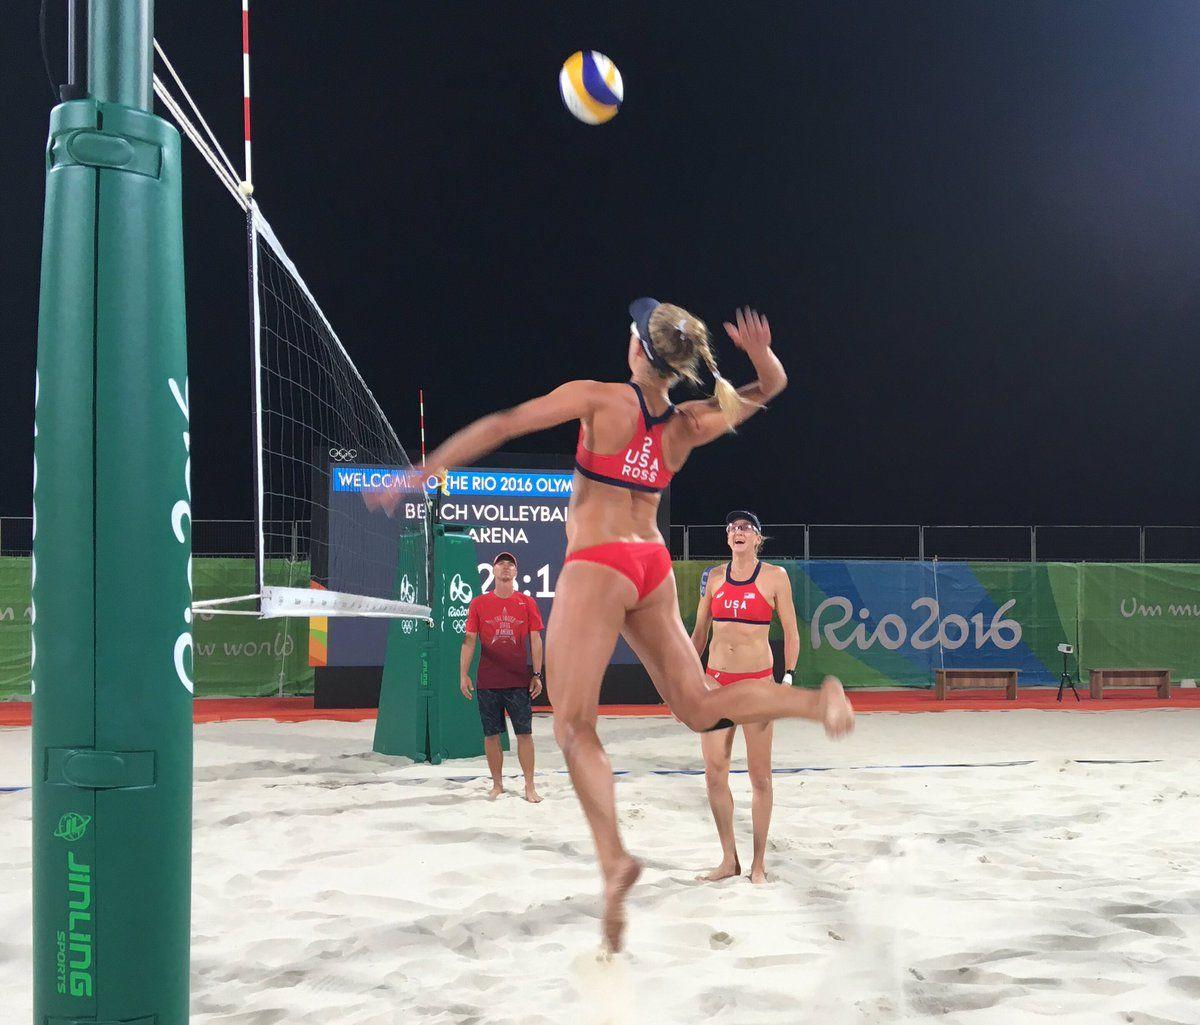 U S Olympic Team Teamusa Usa Volleyball Olympic Team Us Olympics